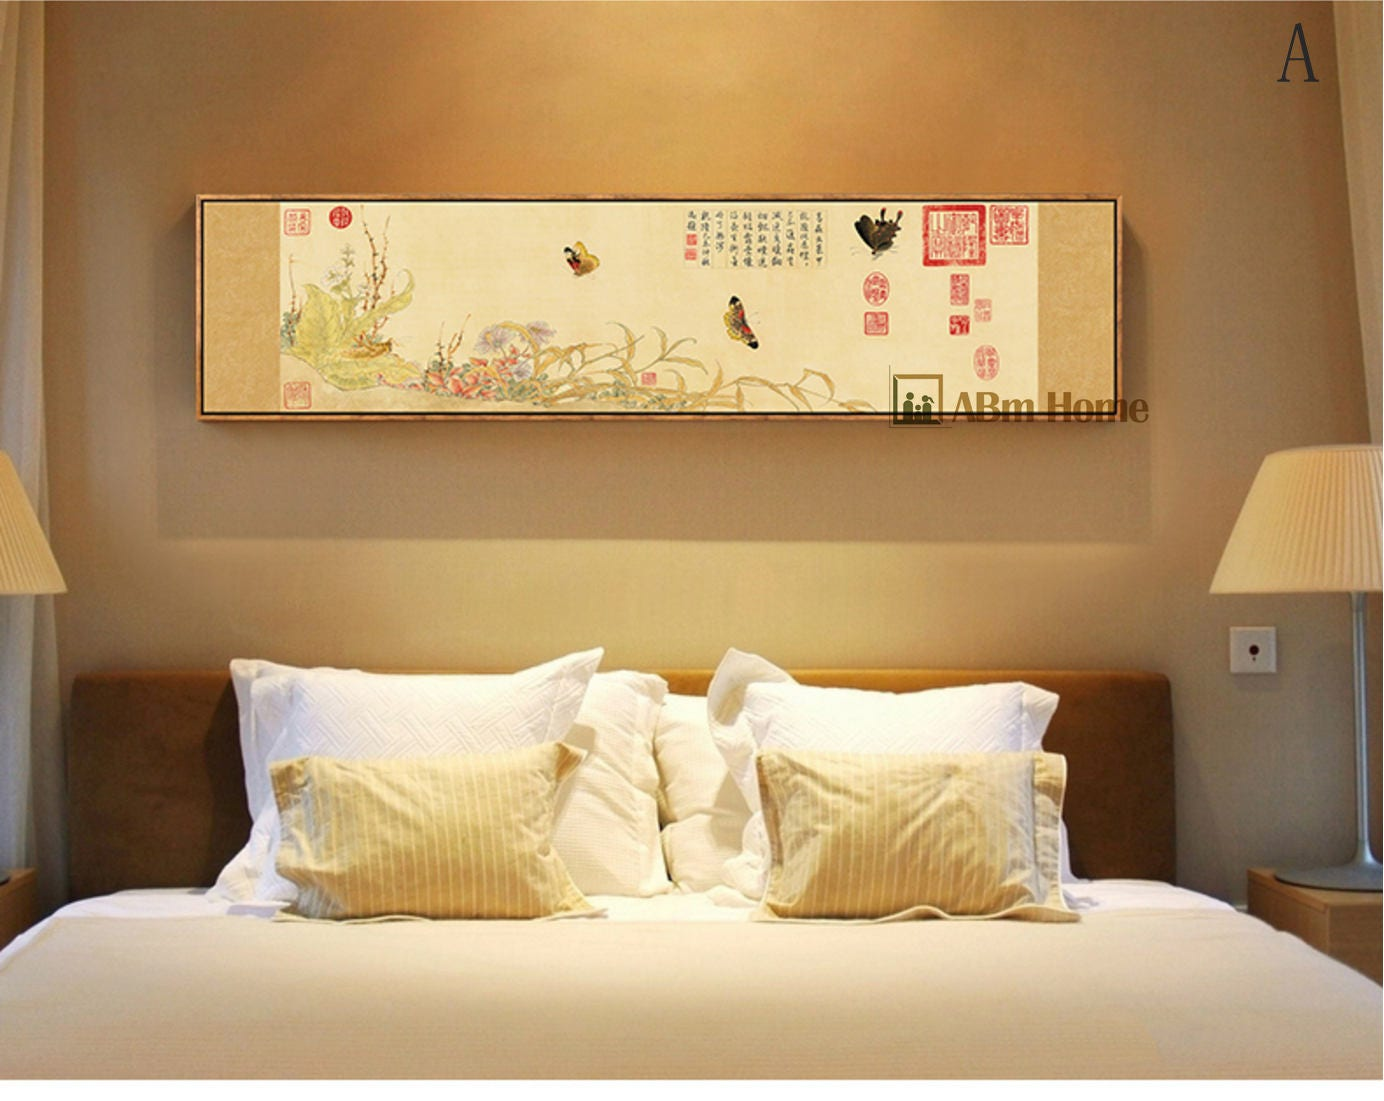 affiche murale gab fine art mural grande toile encadr e etsy. Black Bedroom Furniture Sets. Home Design Ideas